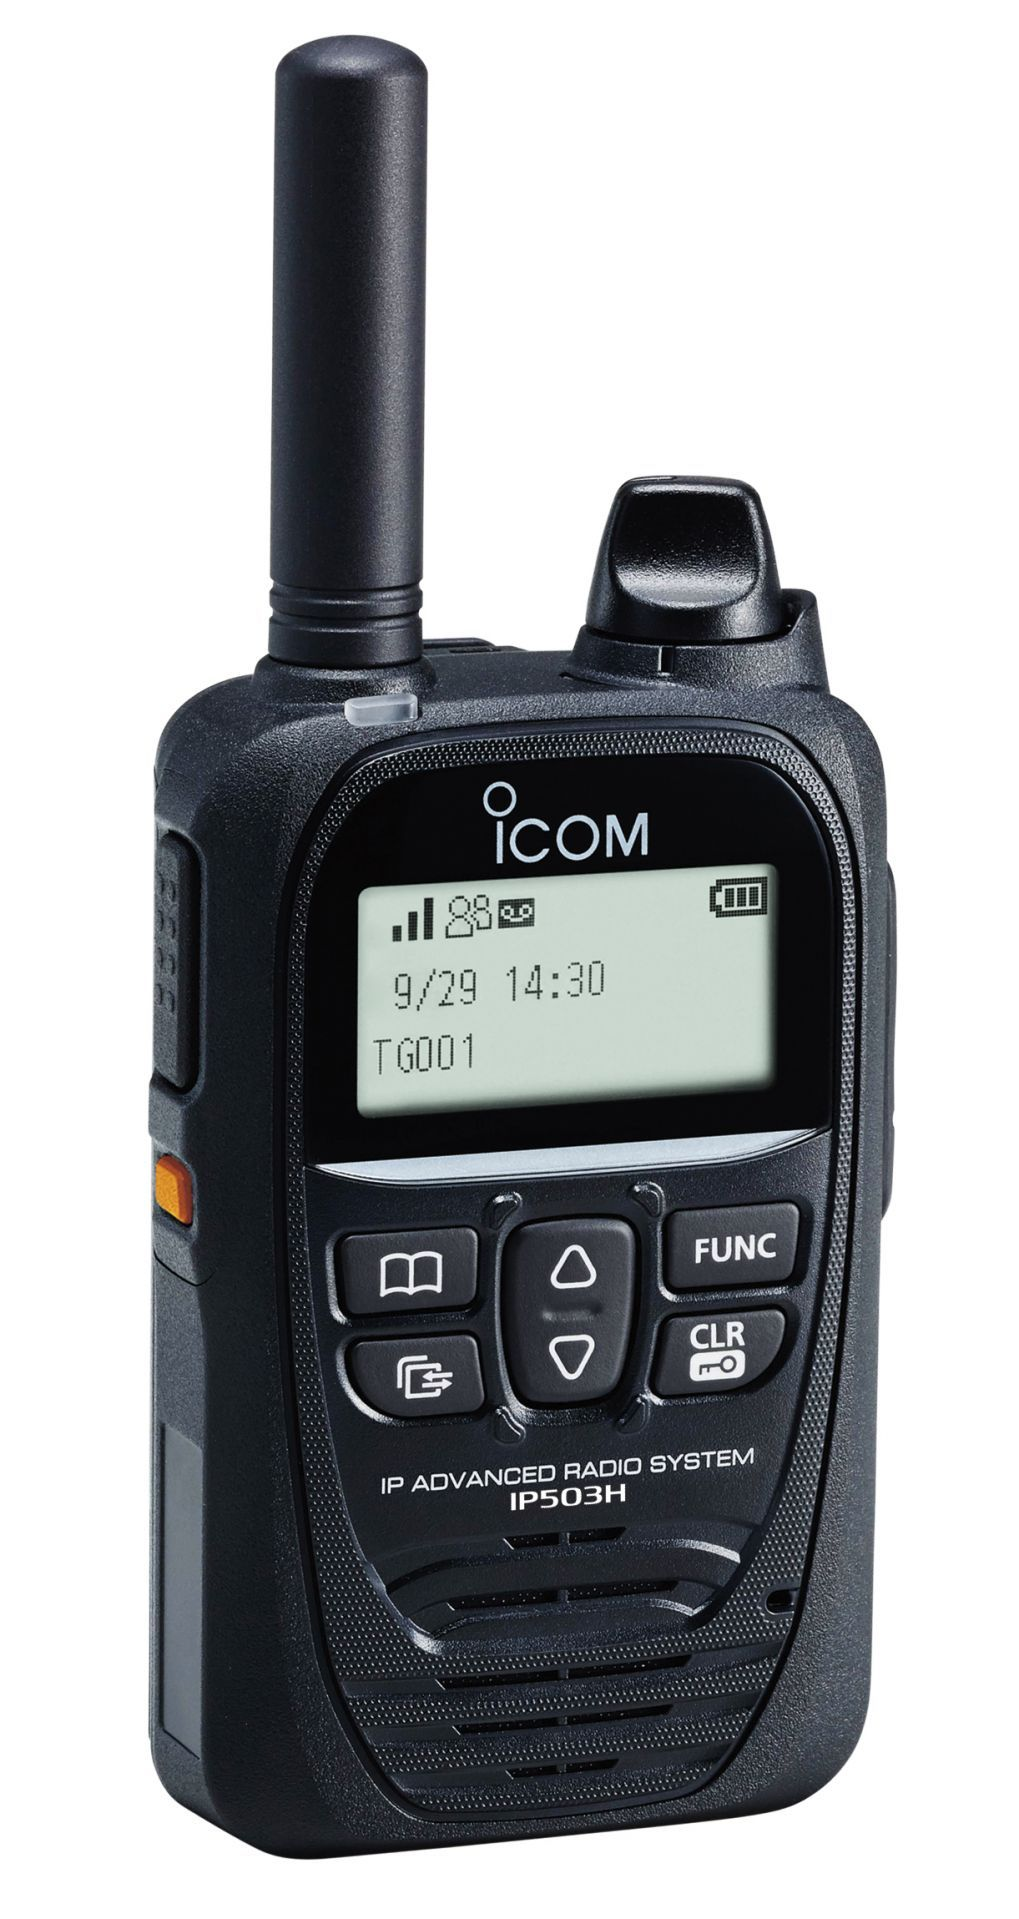 Portatif radio lte (4g) / 3g avec pti communication innovante icom ip503h